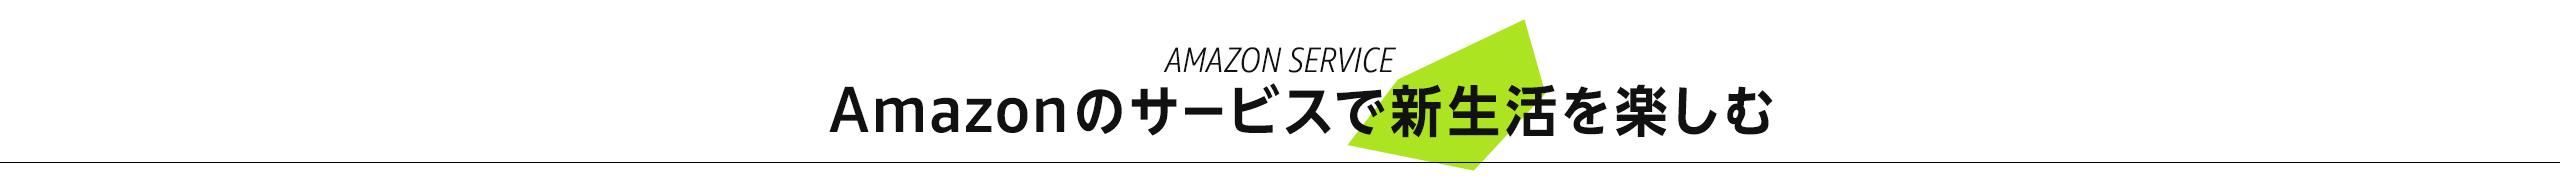 Amazonのサービスで新生活を楽しむ